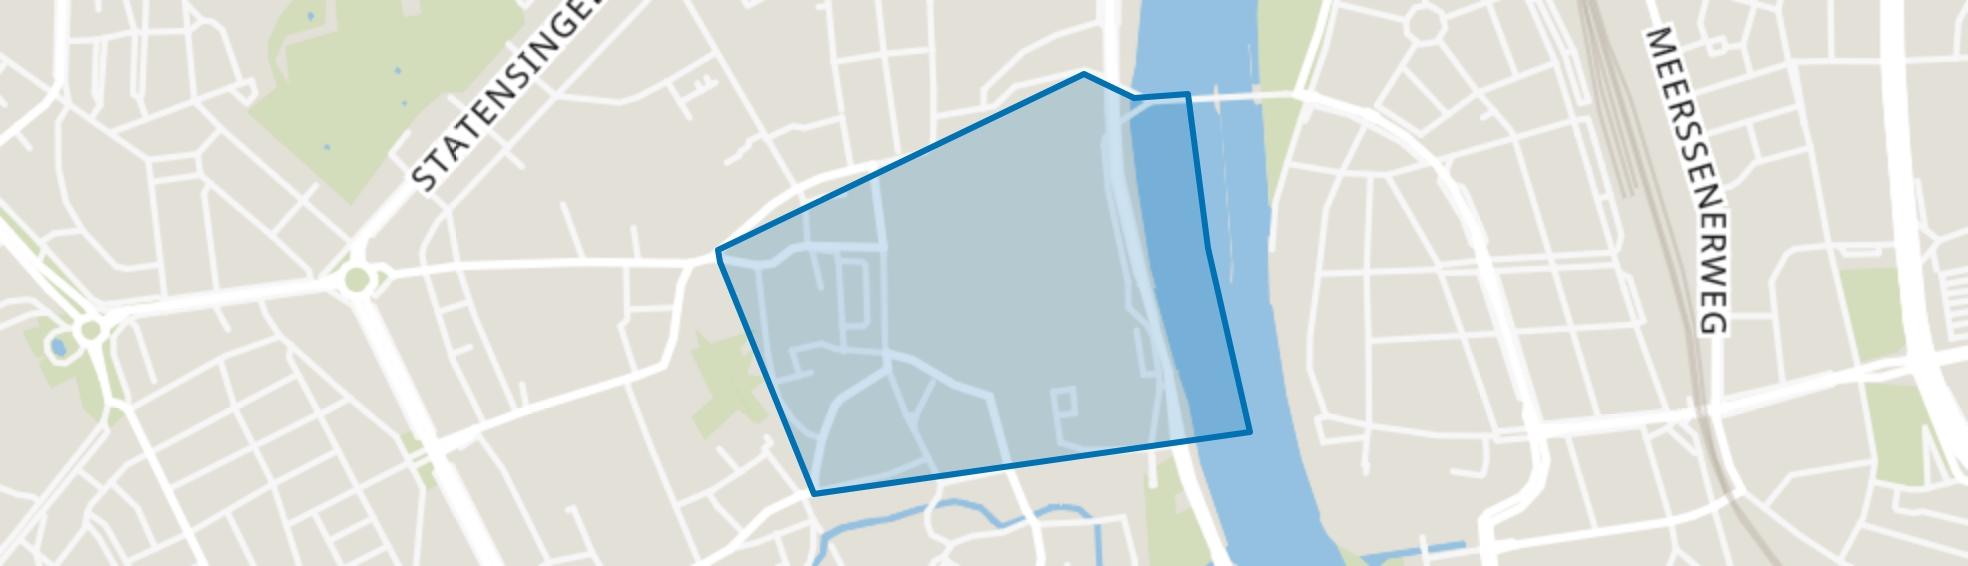 Binnenstad, Maastricht map